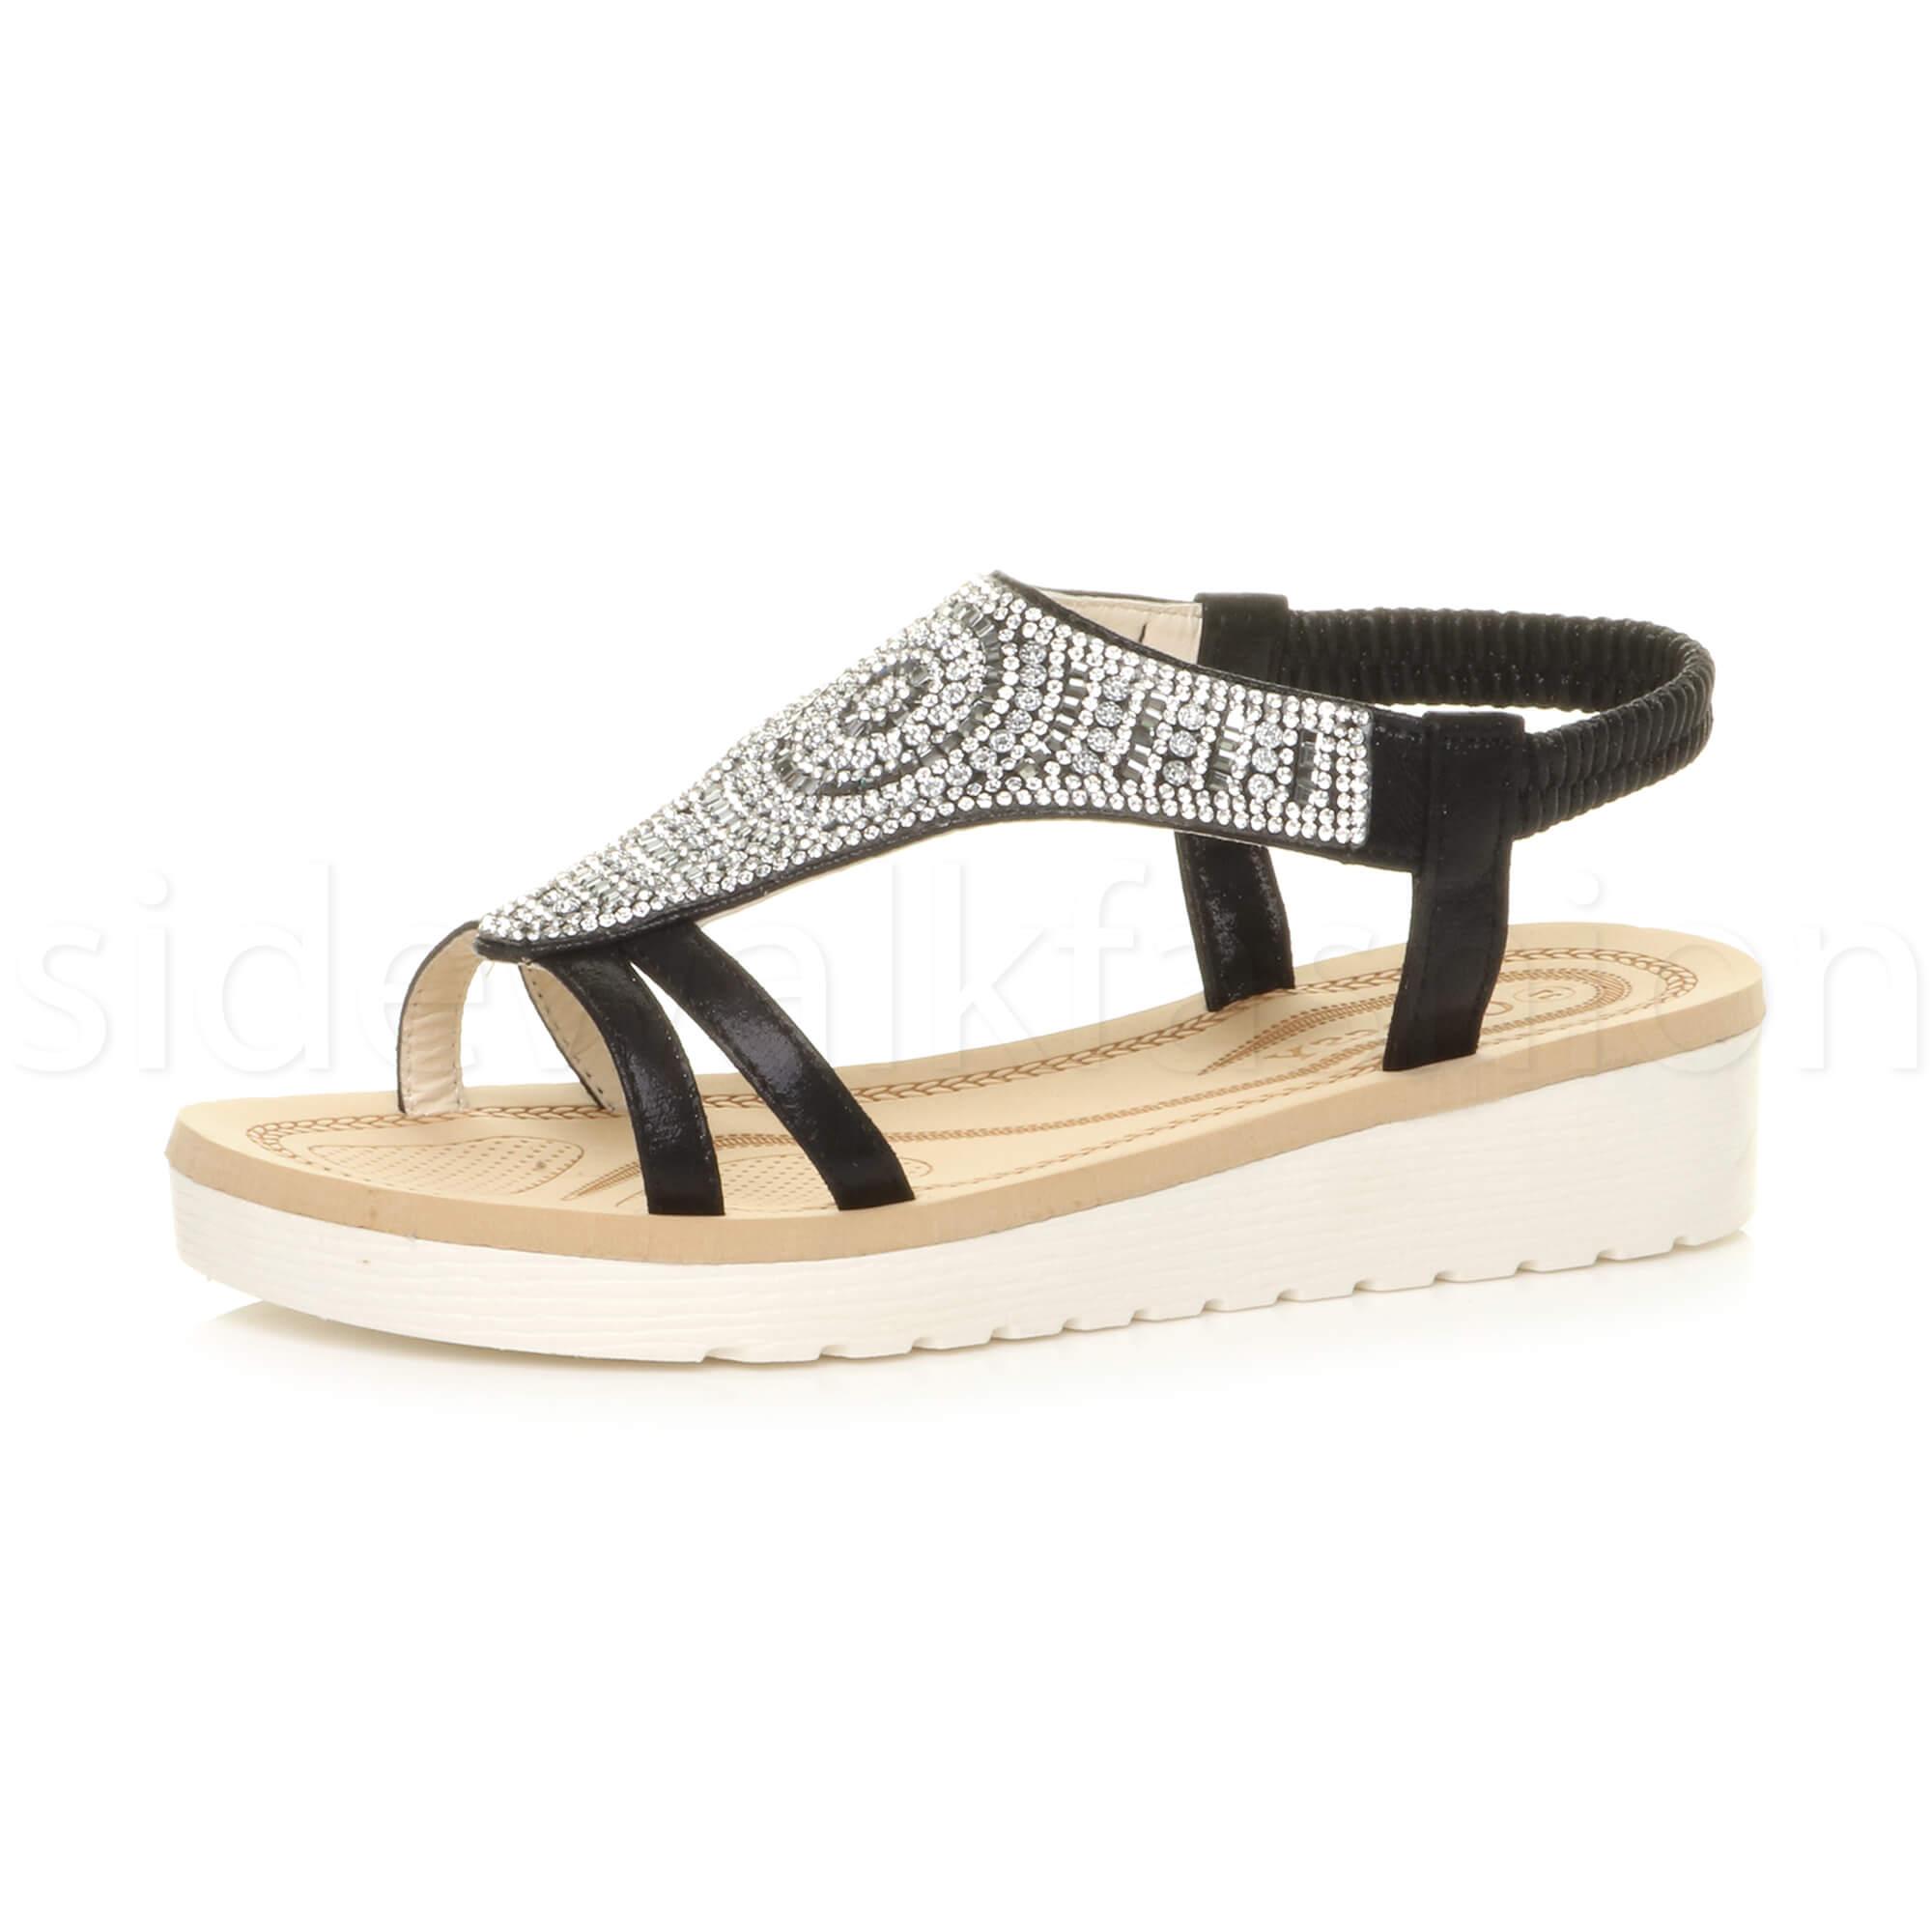 Details about Womens ladies flatform low heel wedge t bar diamante slingback sandals shoes